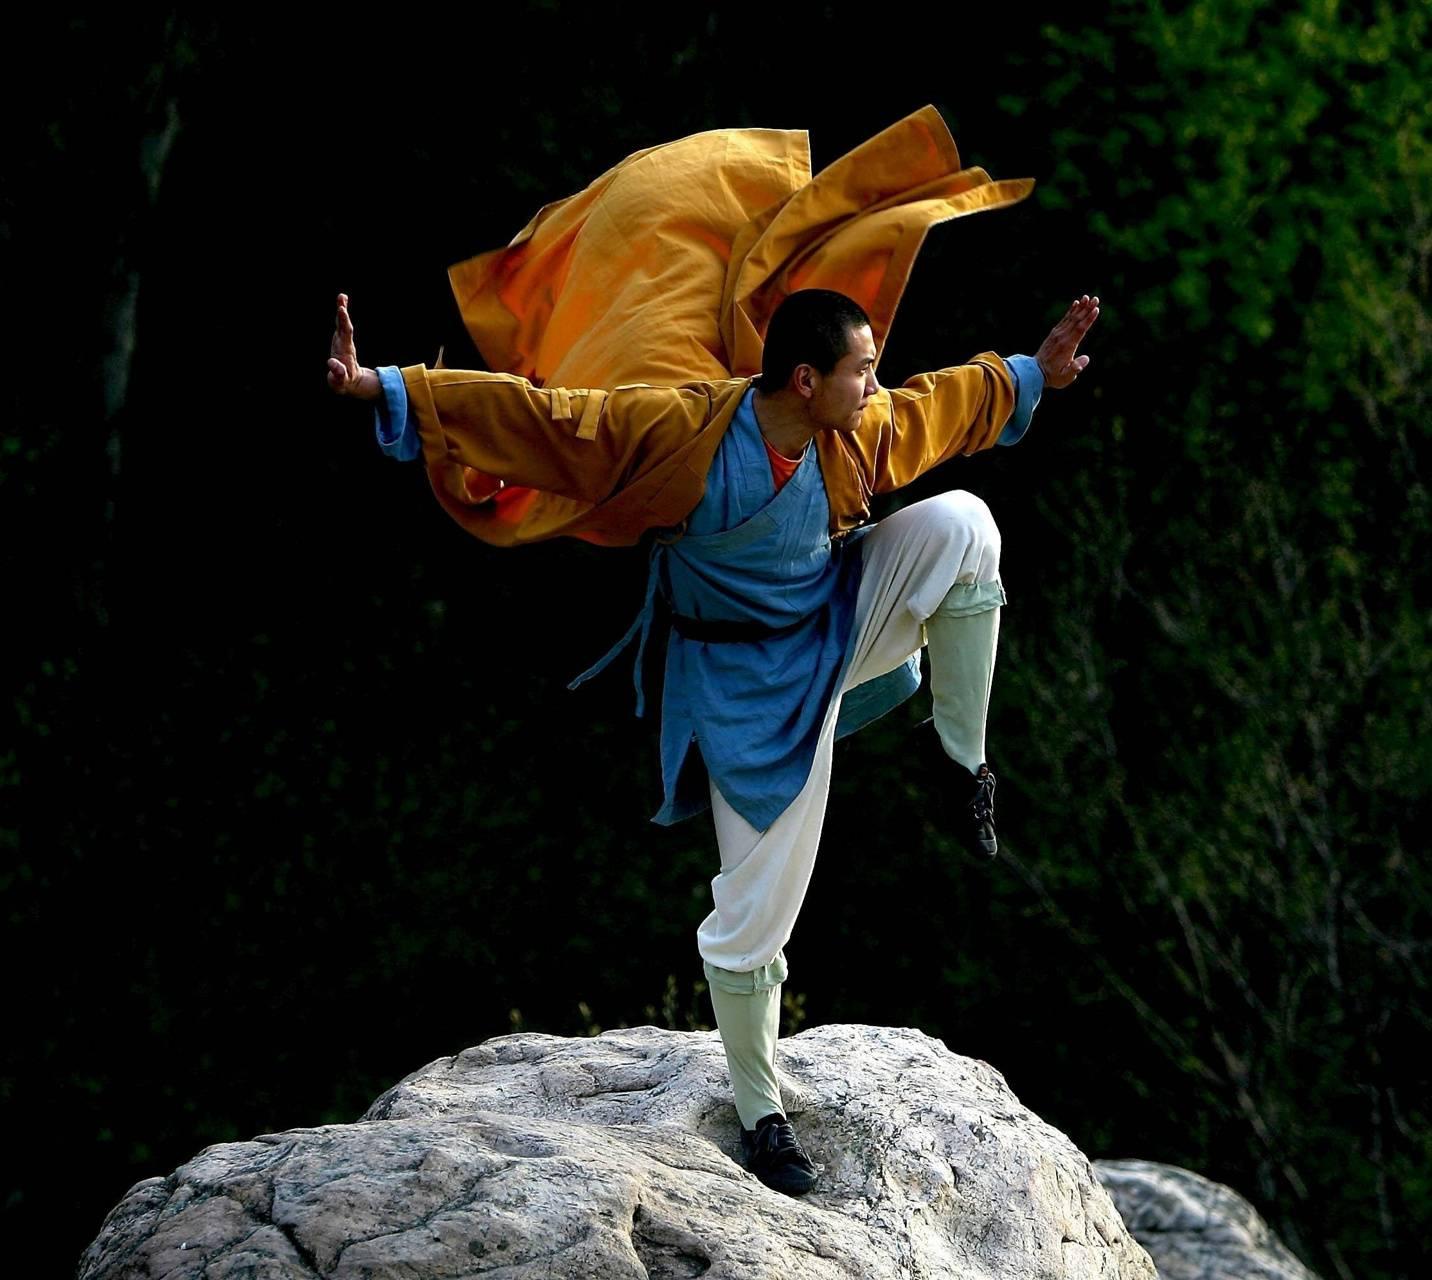 shaolin monk Wallpaper by troublemakervi - 5e - Free on ZEDGE™